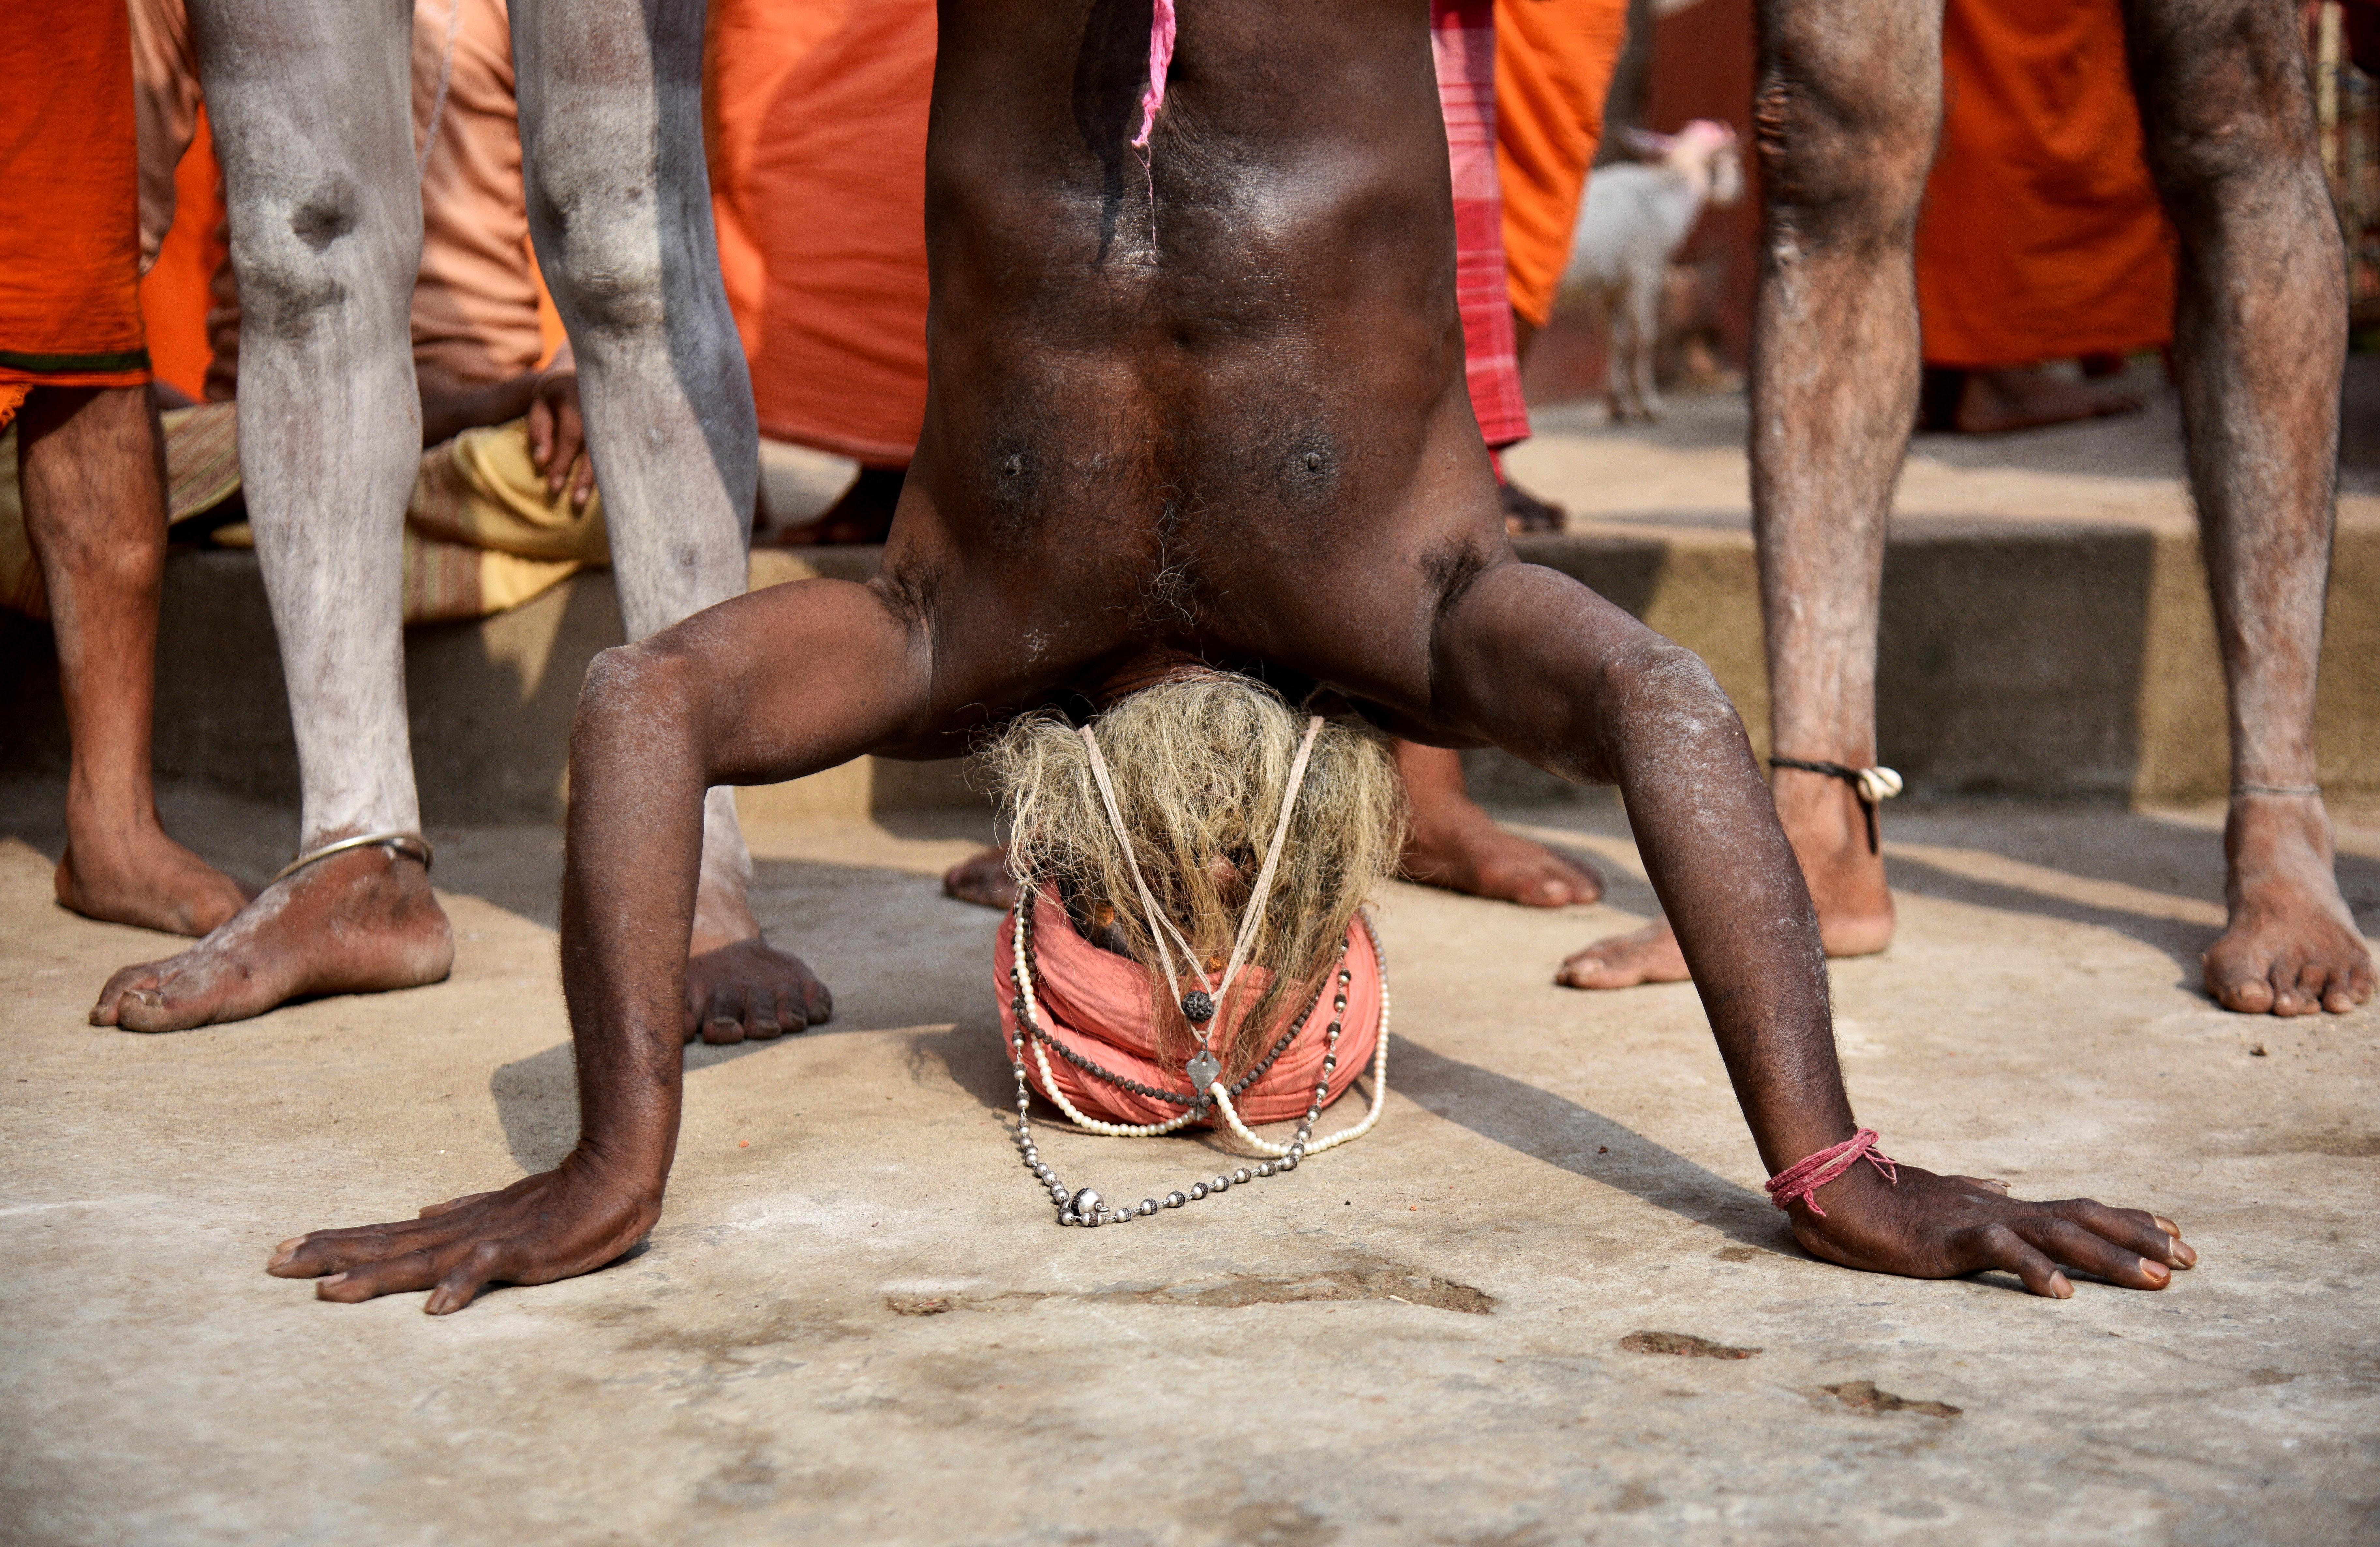 A religious leader performs yoga on International Yoga Day at Kamakhya temple in Guwahati. (Anuwar Hazarika/Reuters)